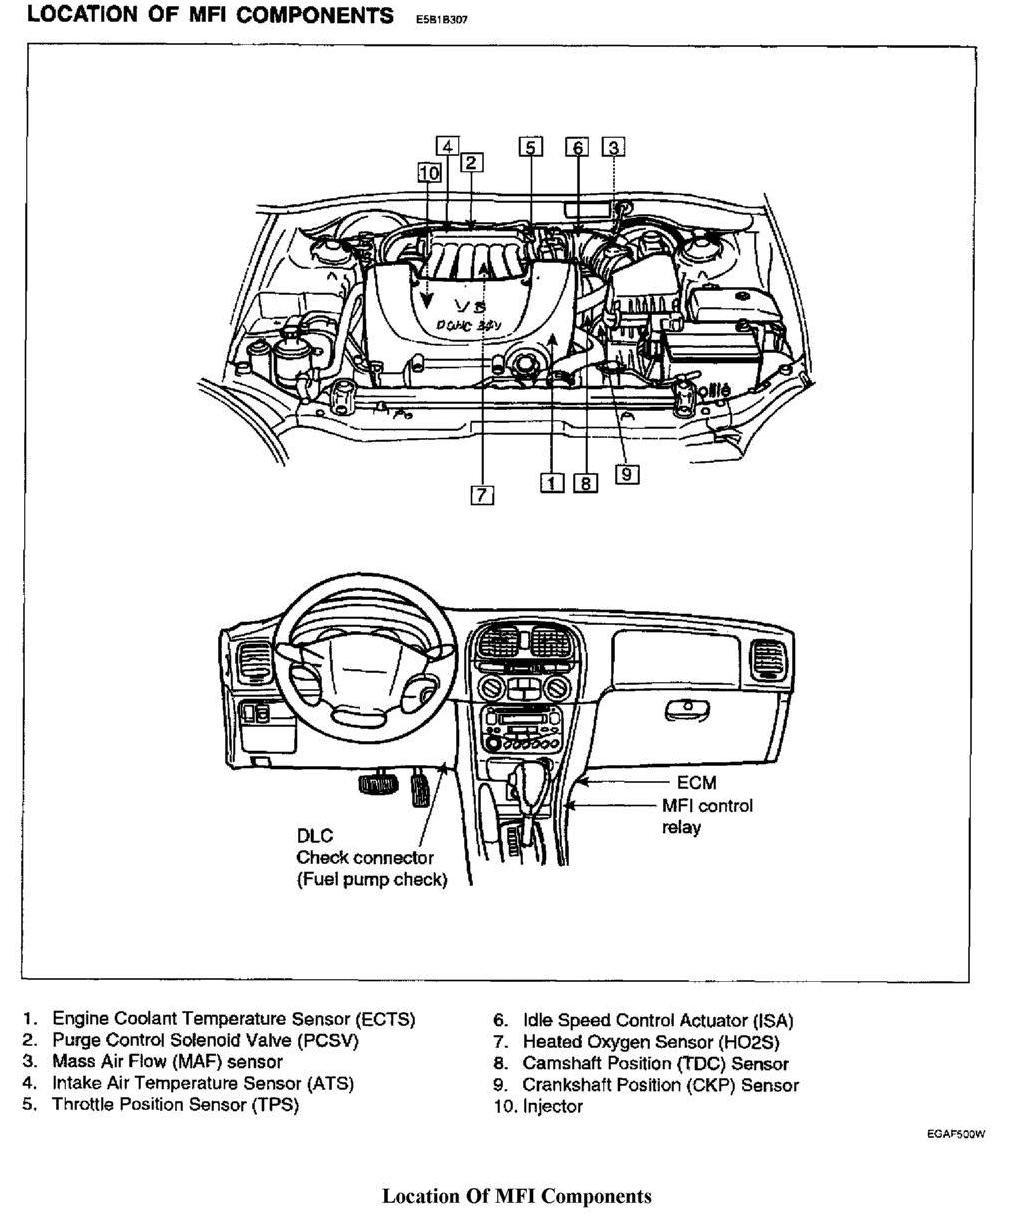 Hyundai Accent Temp Gauge Wiring Diagram Engine Brake System Diagram Begeboy Wiring Diagram Source